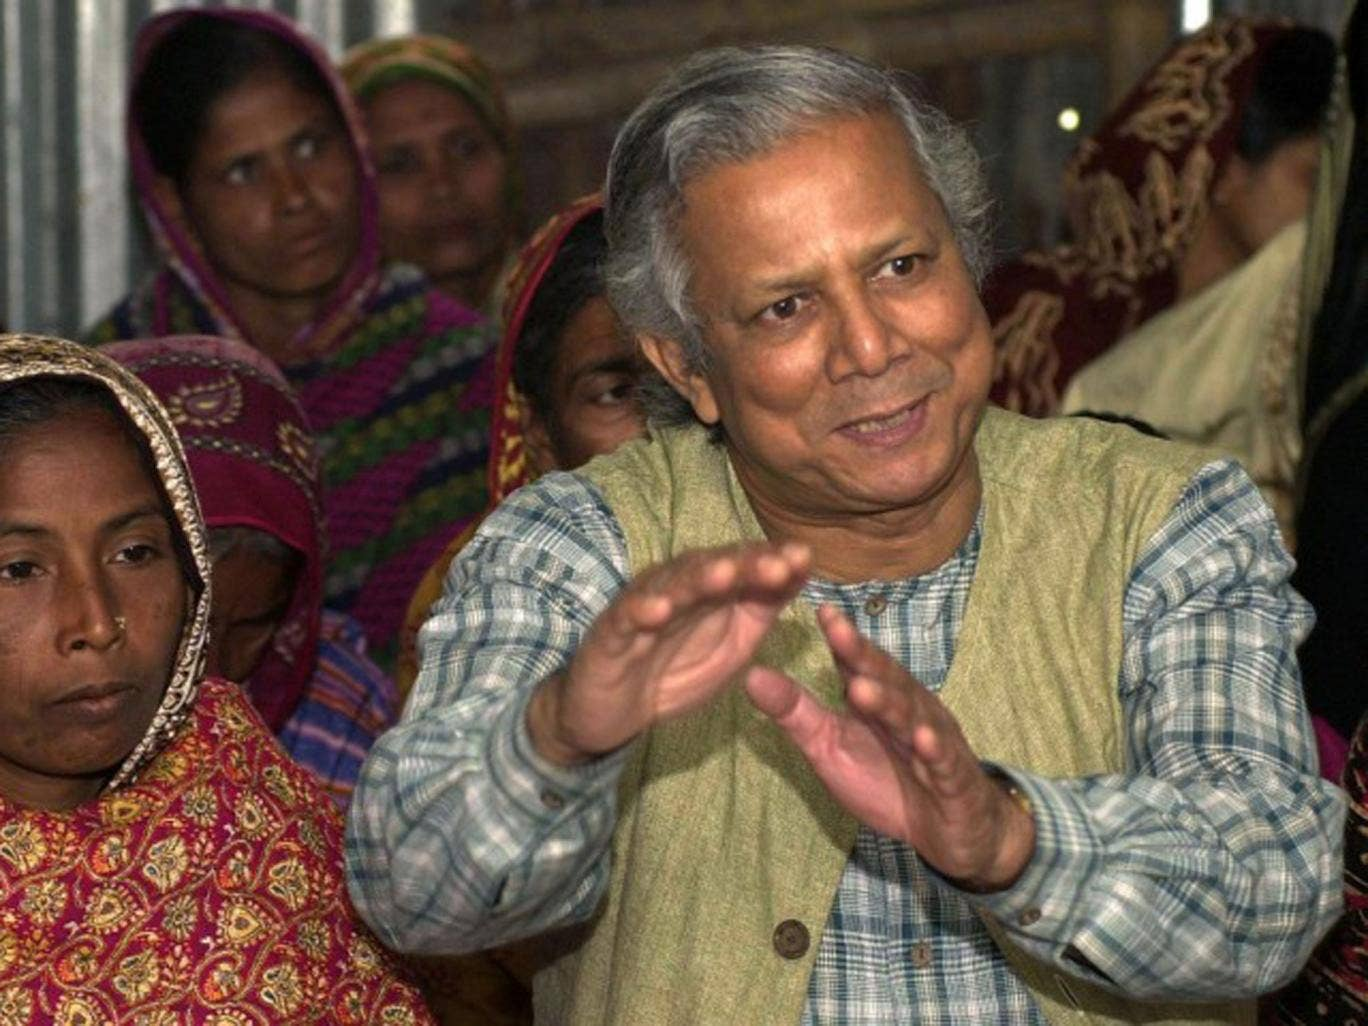 Professor Mohammed Yunus, founder of Grameen Bank